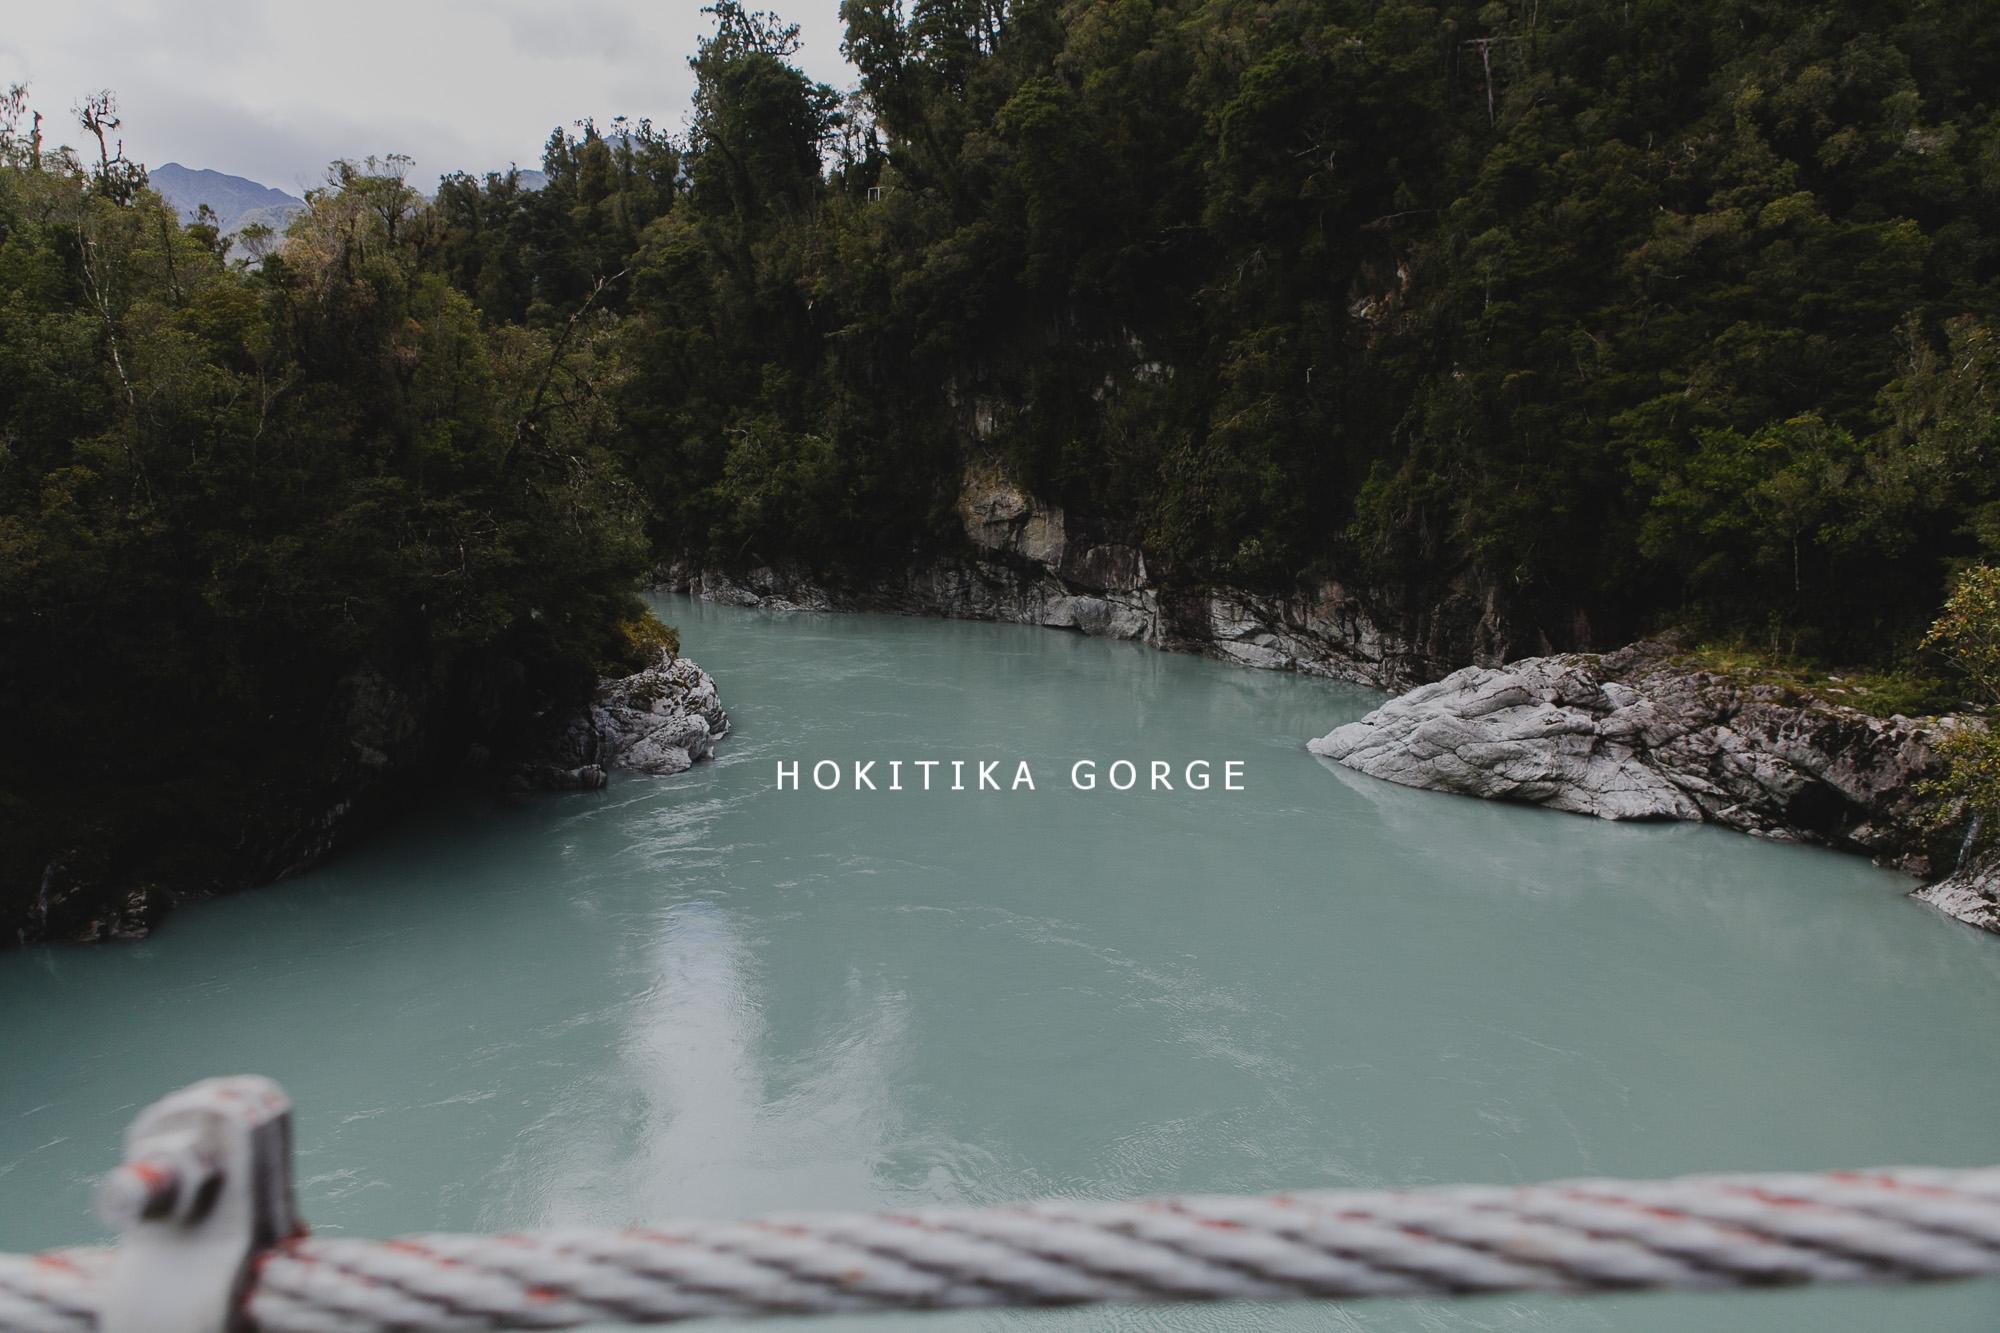 hokitika-gorge-new-zealand-travel-diary-jysla-kay-001